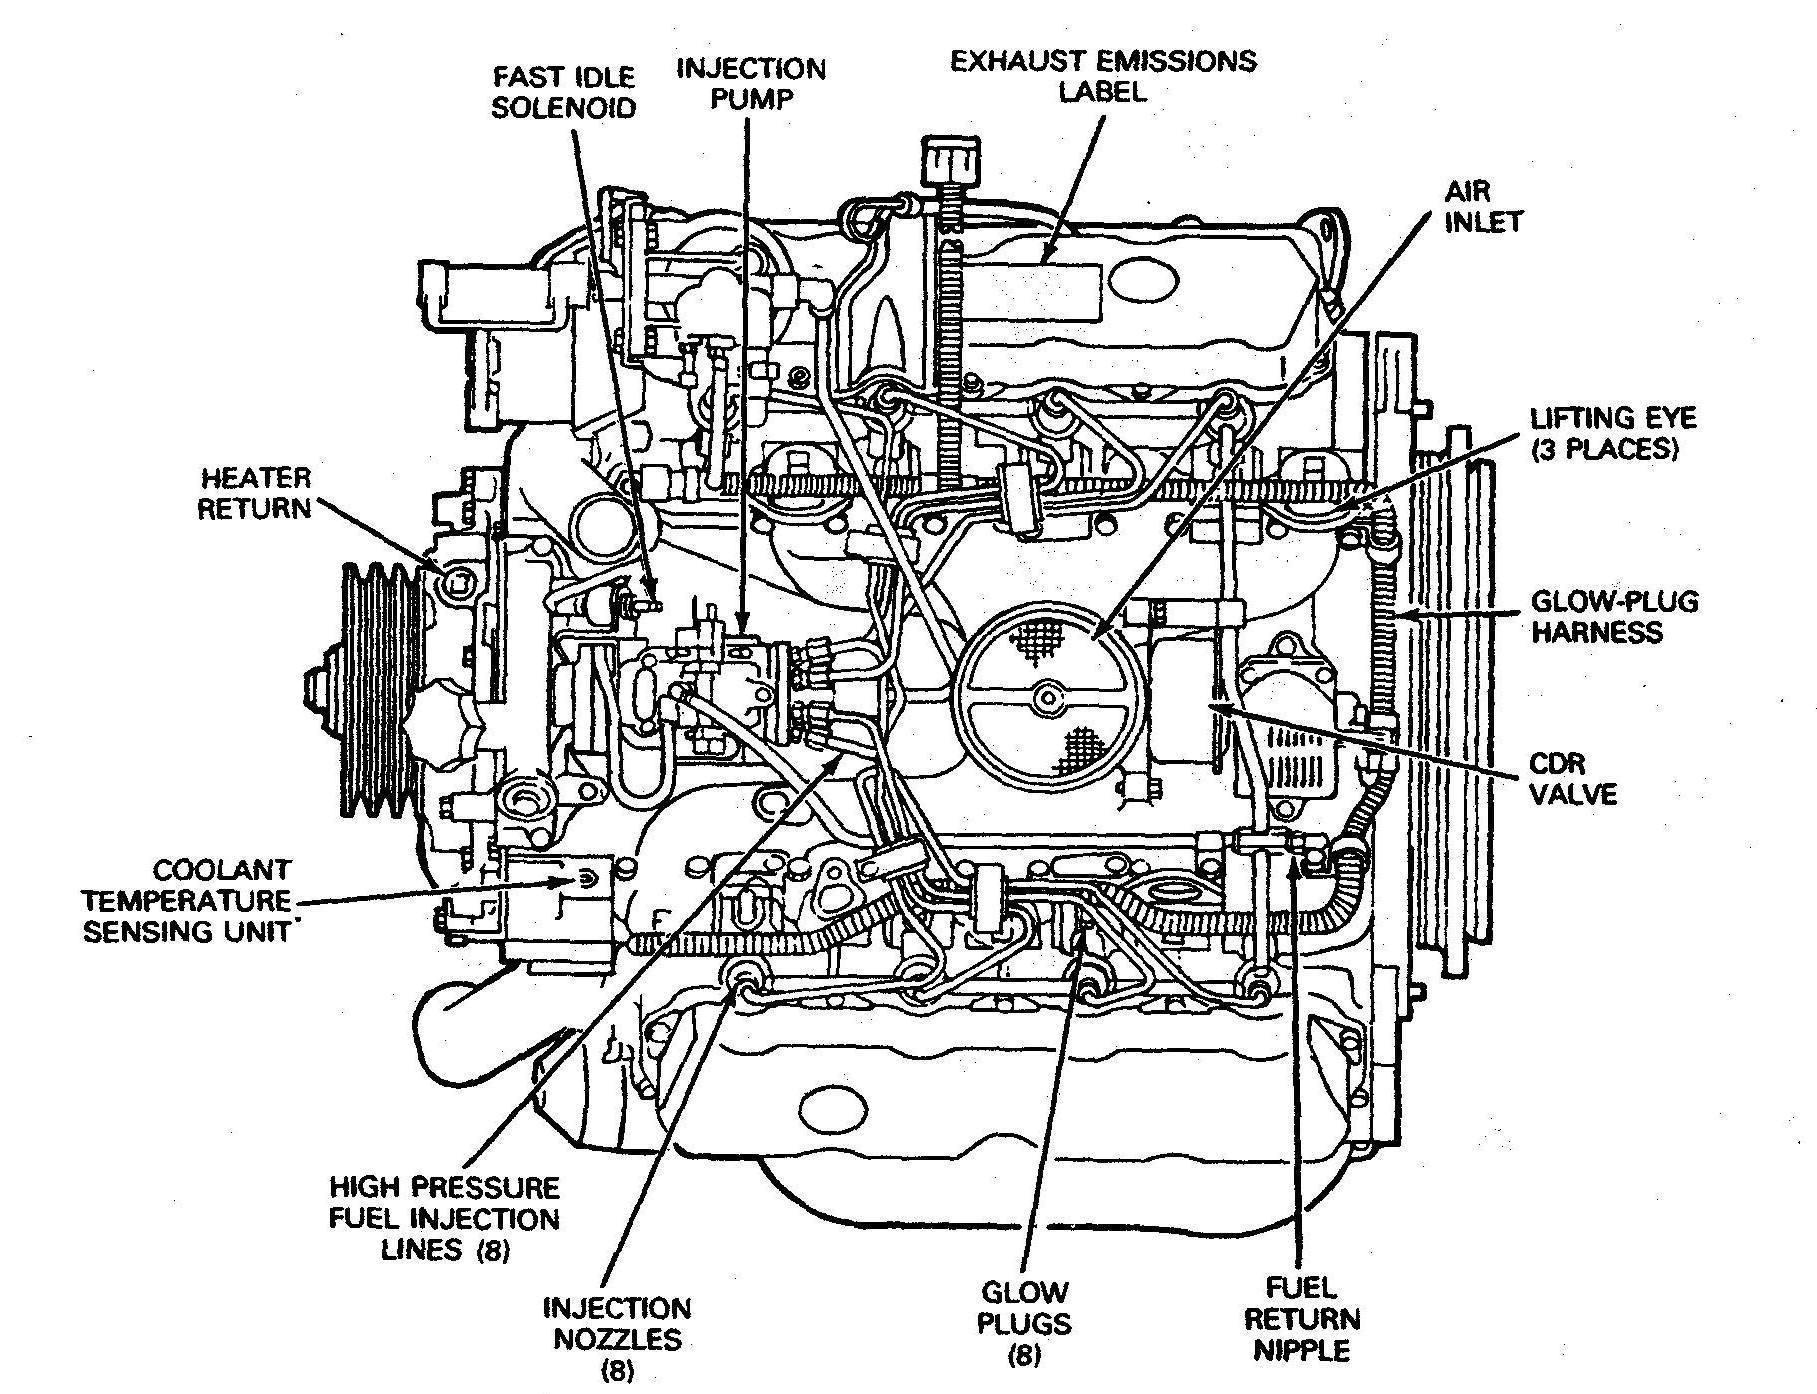 Diagram Of Engine Parts 20fresh Bmw Engine Diagram Of Diagram Of Engine Parts